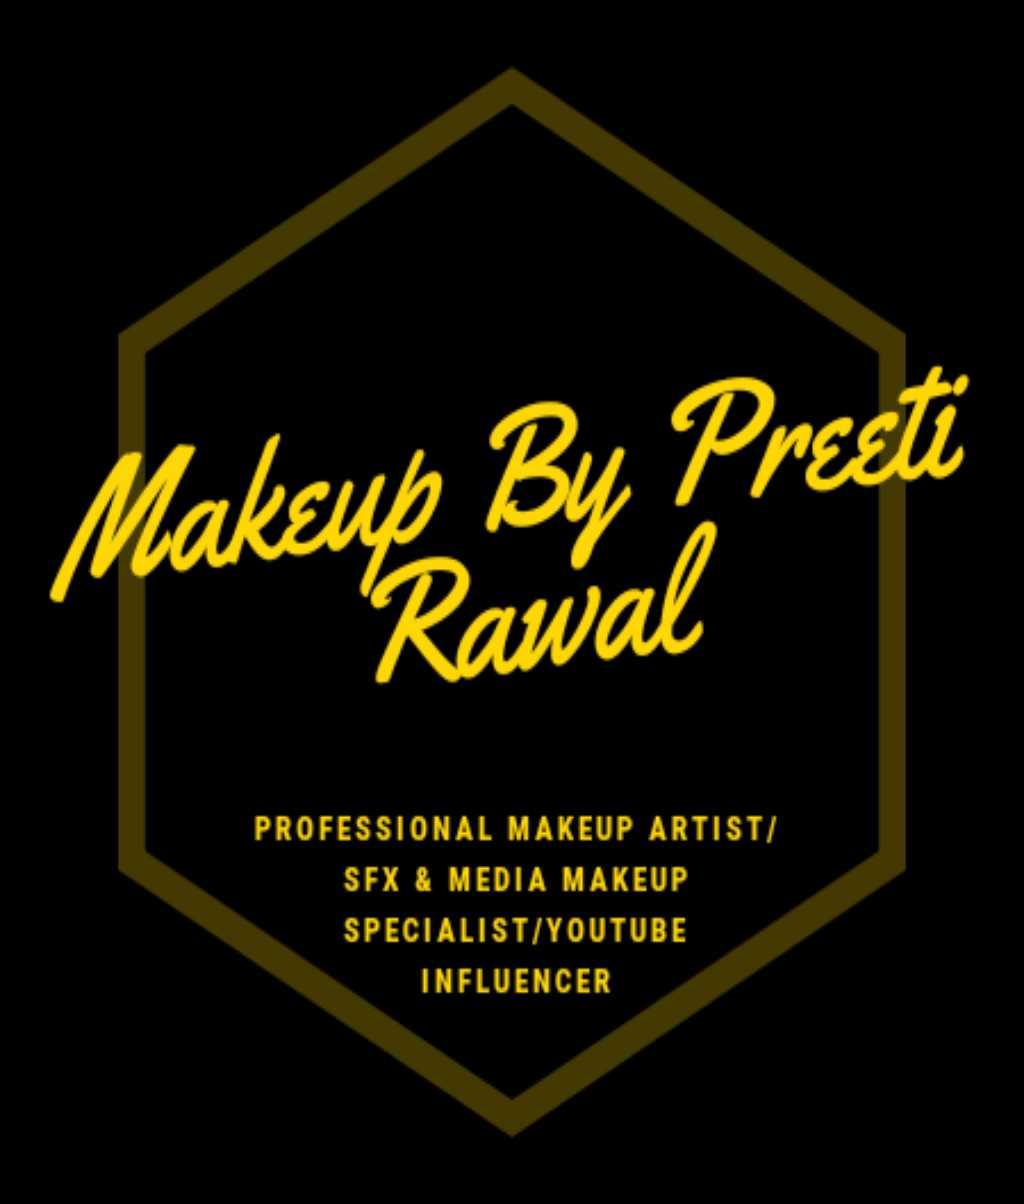 MAKEUP BY PREETI RAWAL